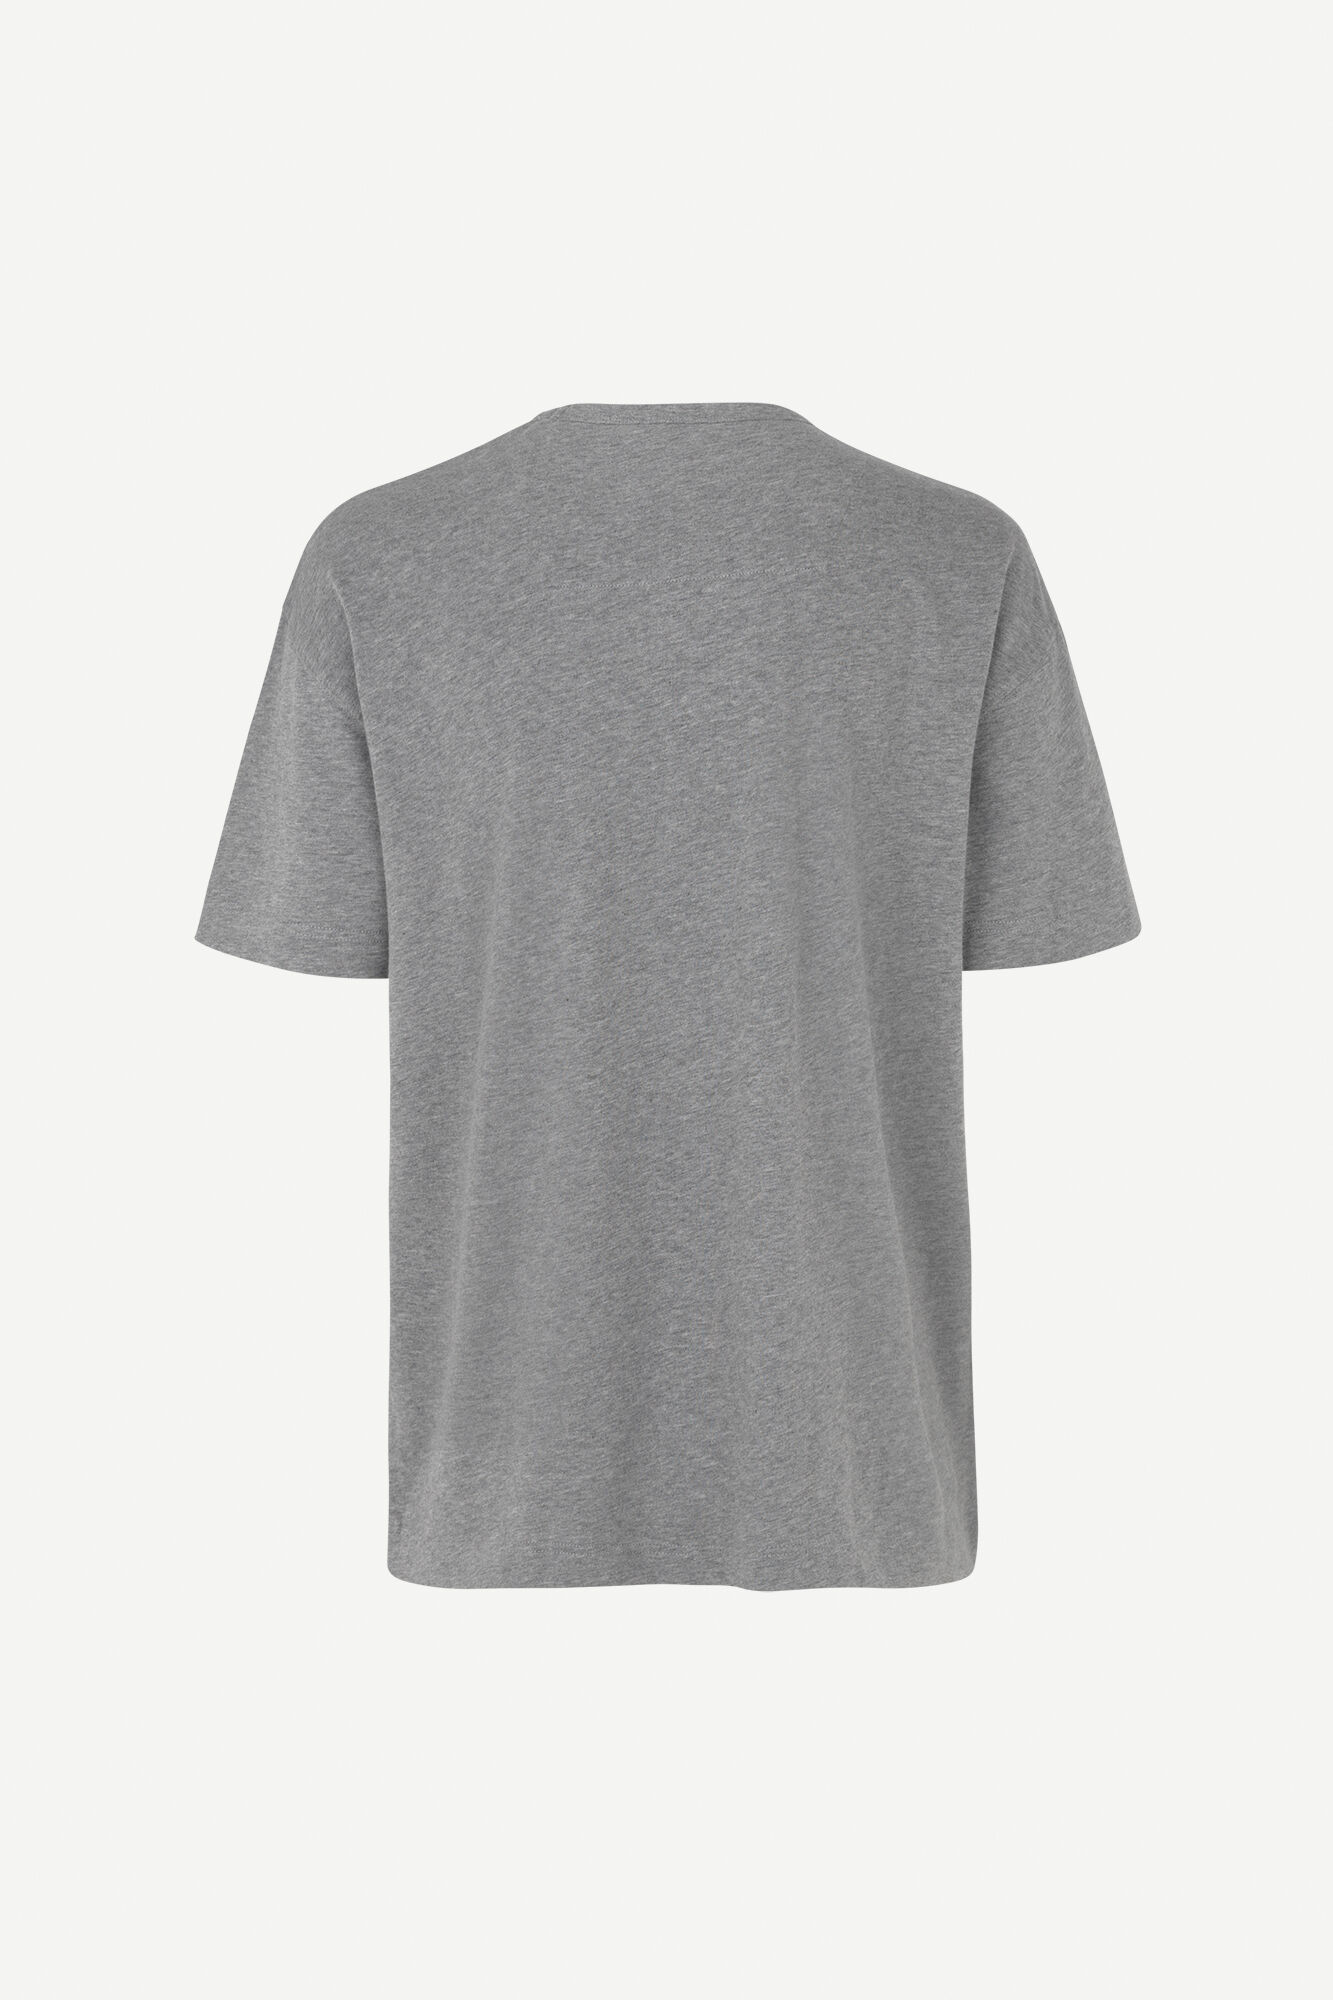 Toscan t-shirt 11415